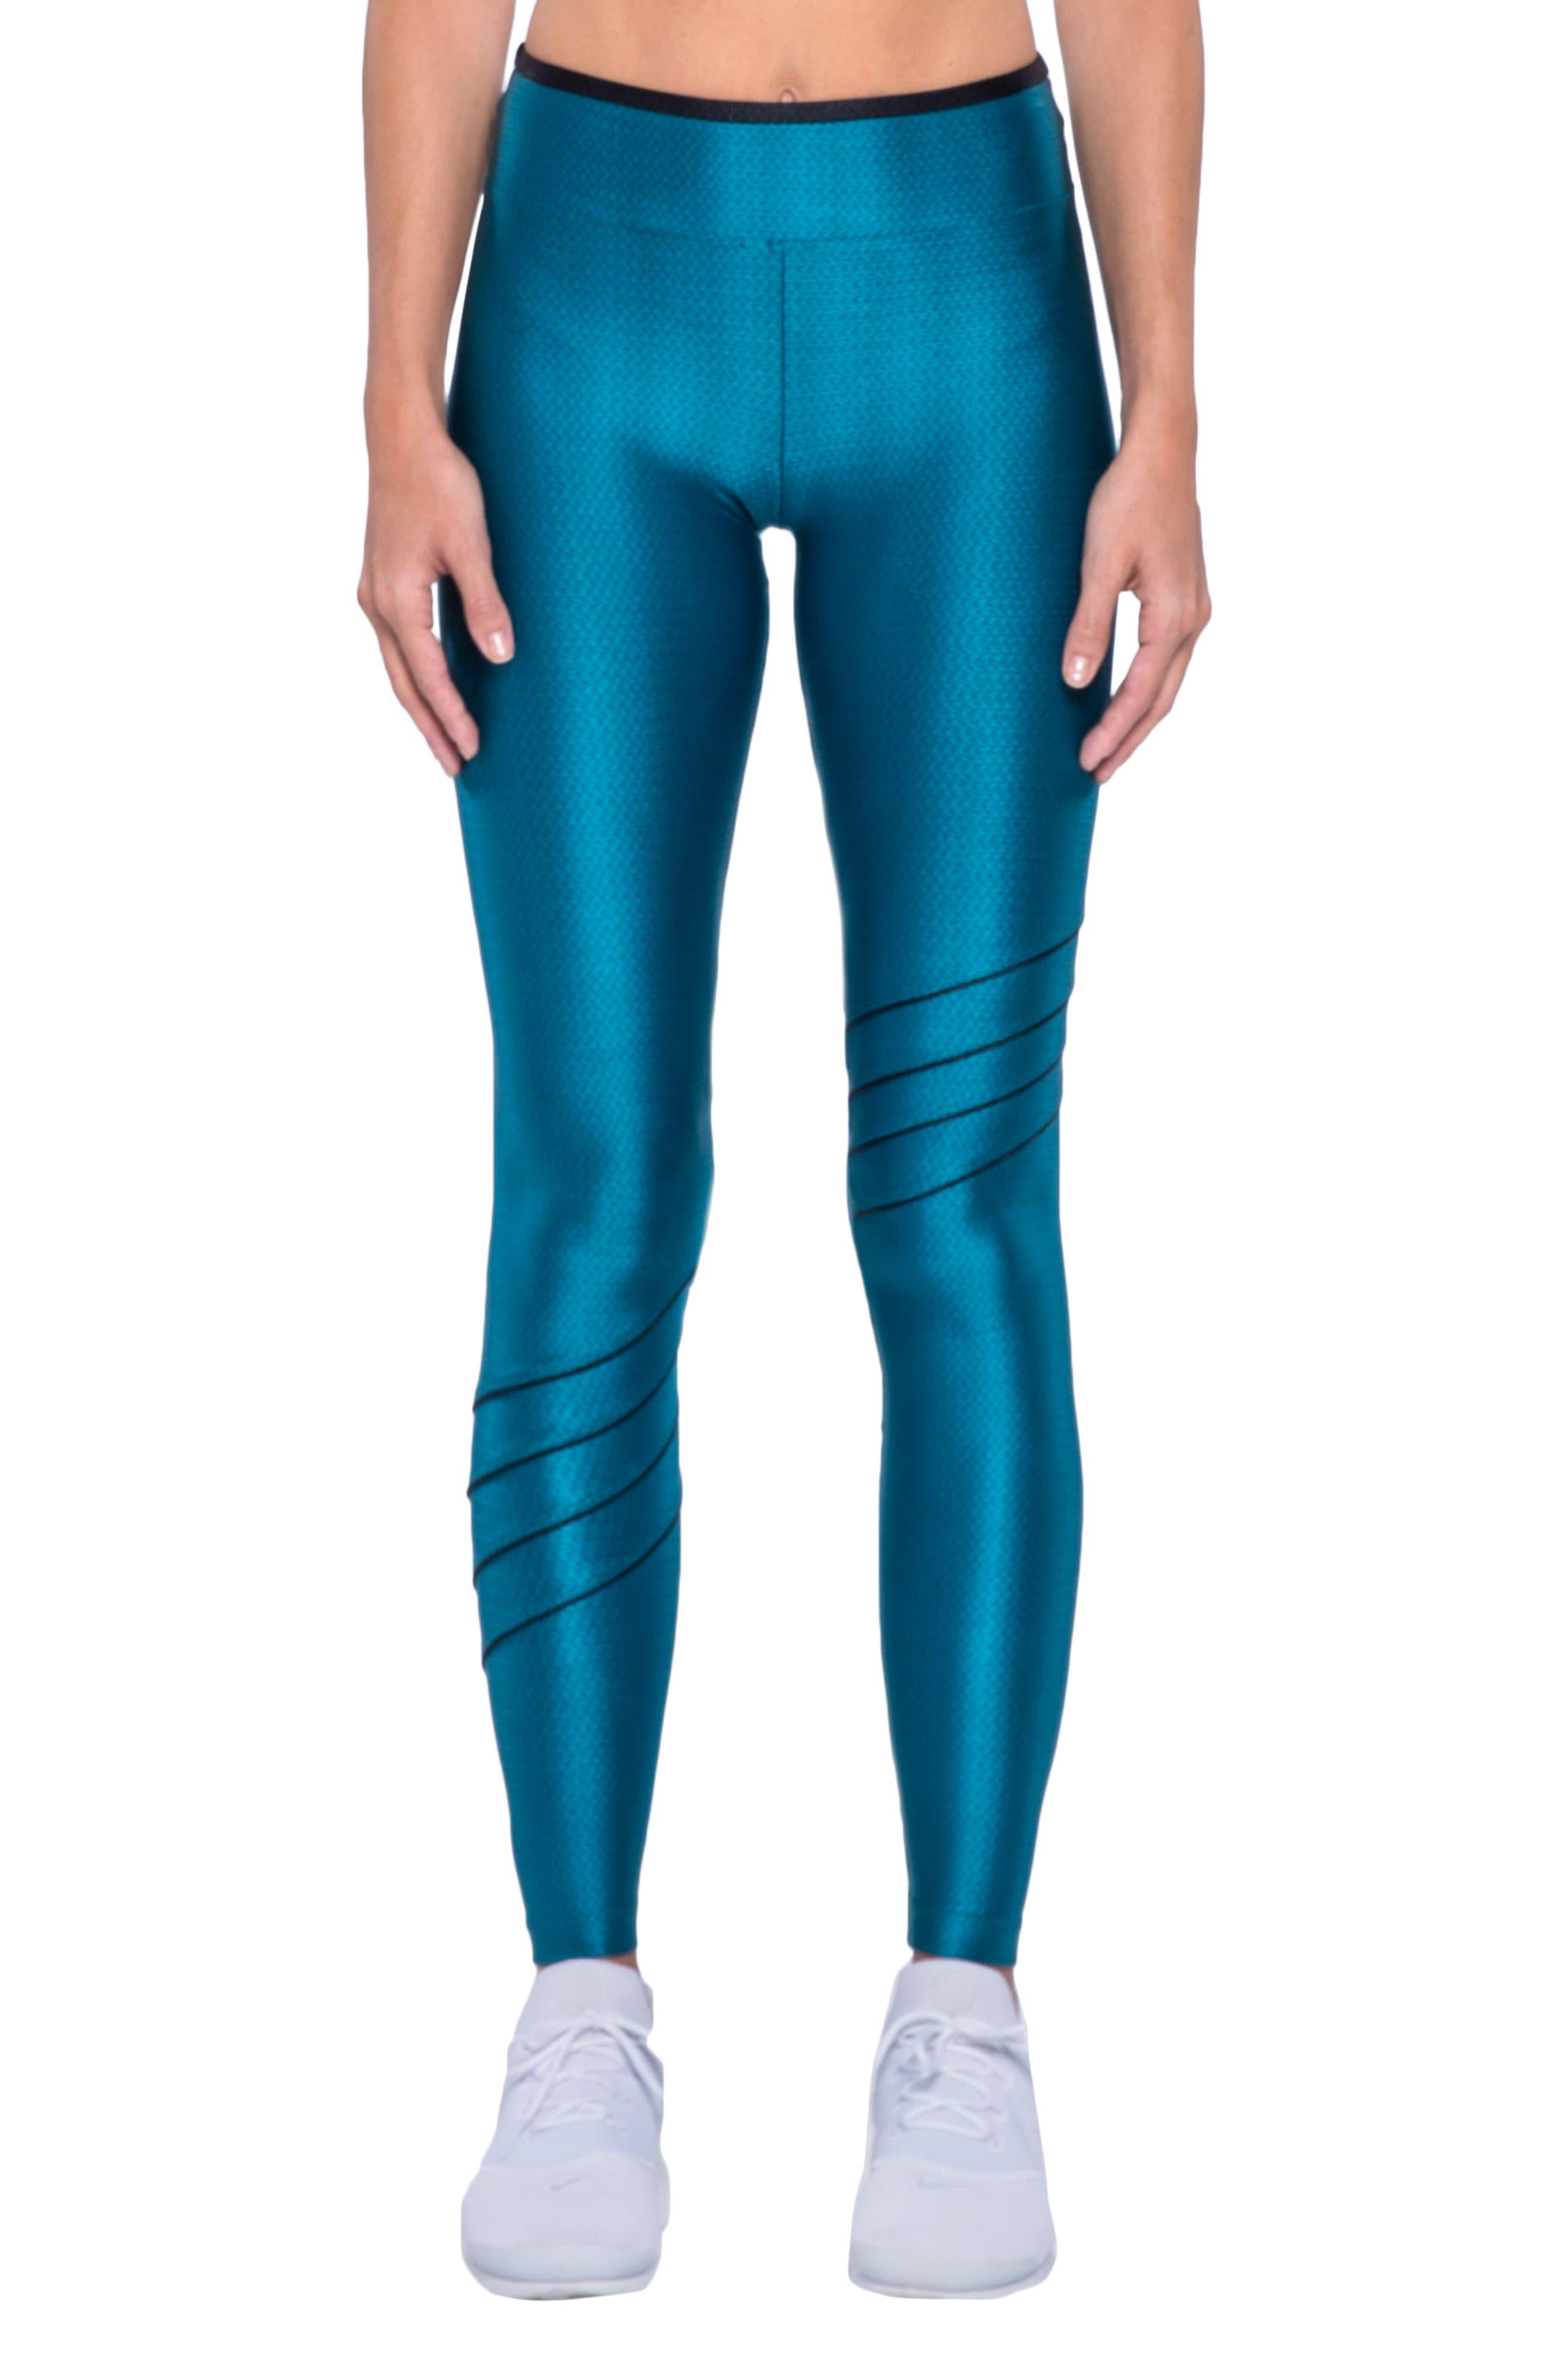 Illicit High Waist Leggings,                         Main,                         color, 400